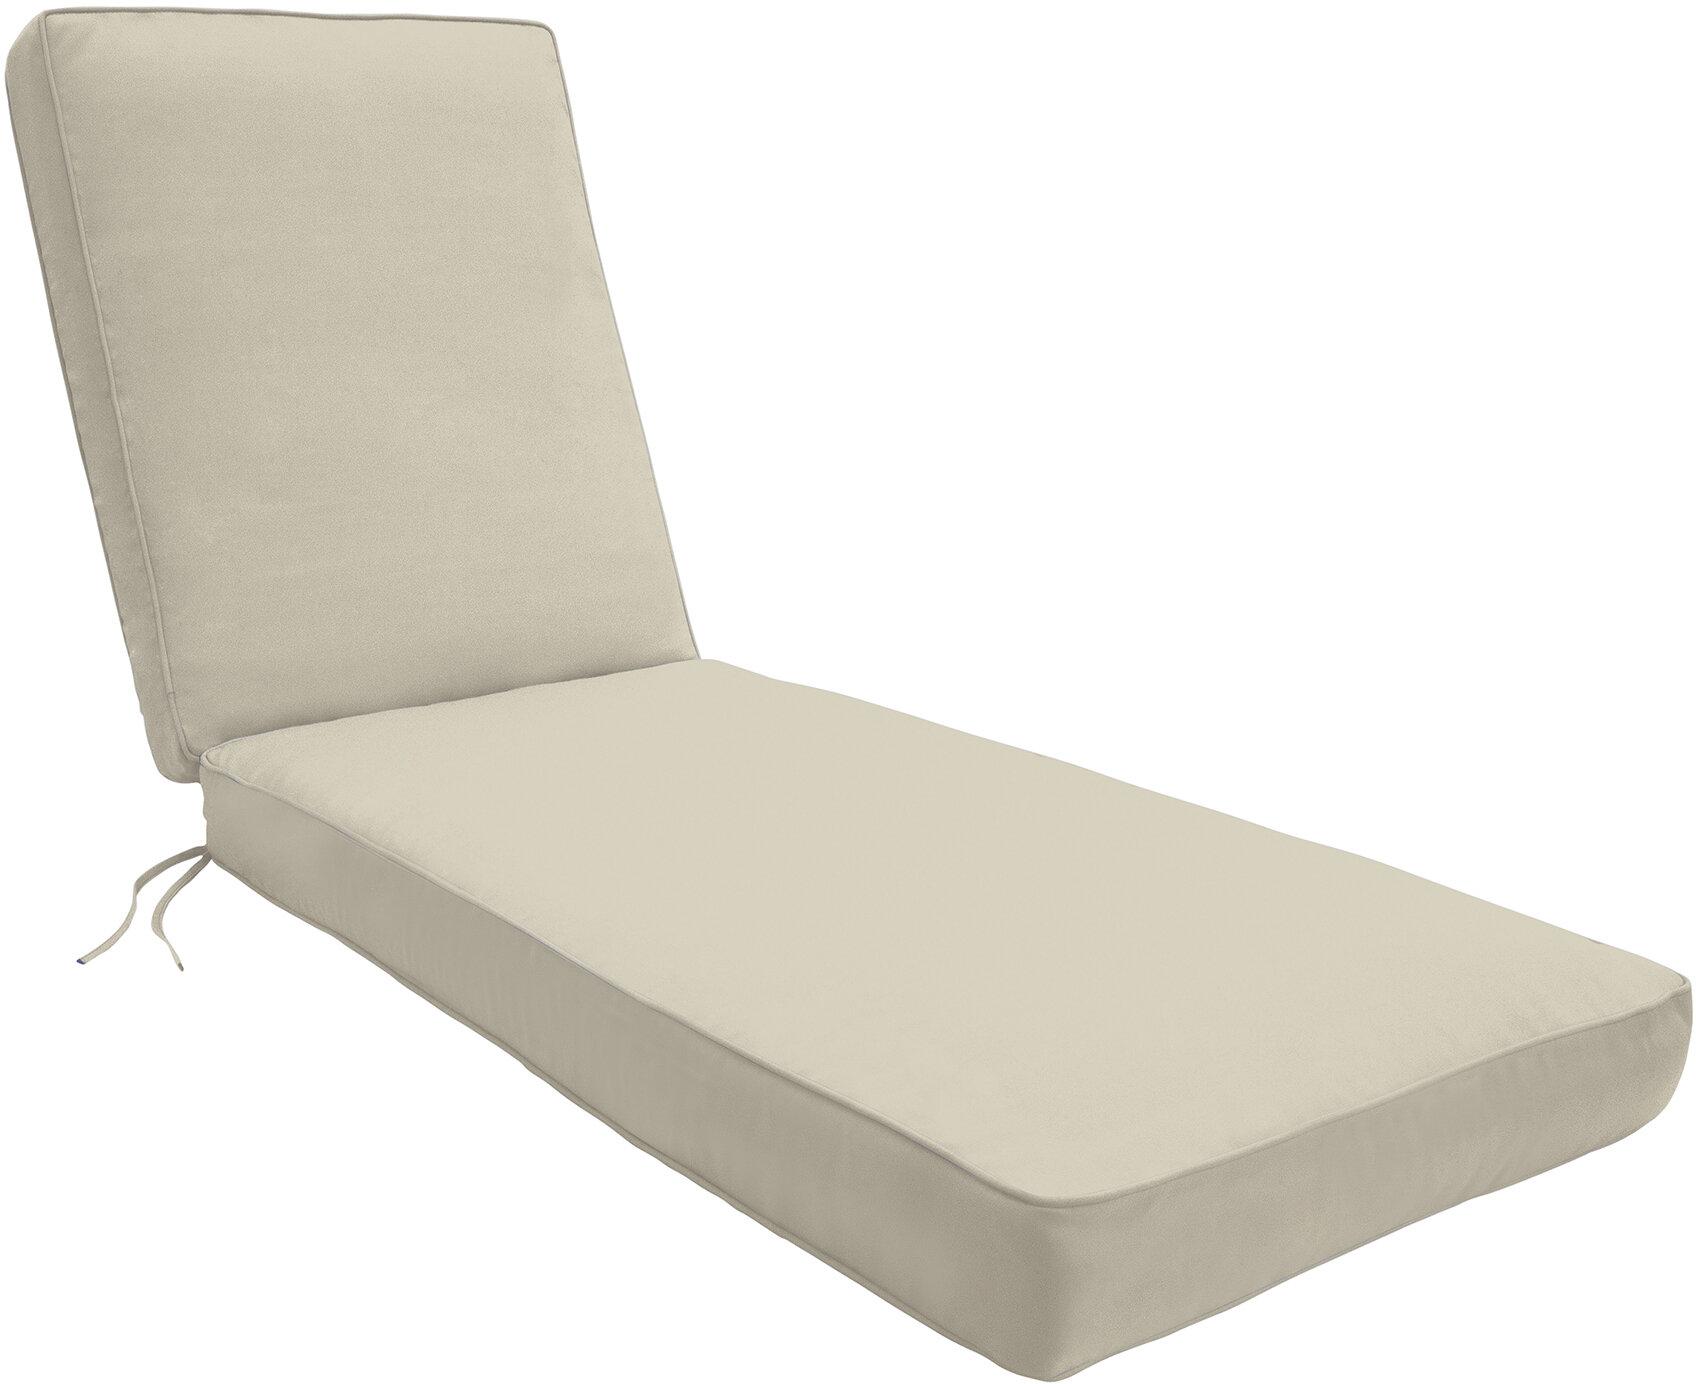 - Wayfair Custom Outdoor Cushions Indoor/Outdoor Chaise Lounge